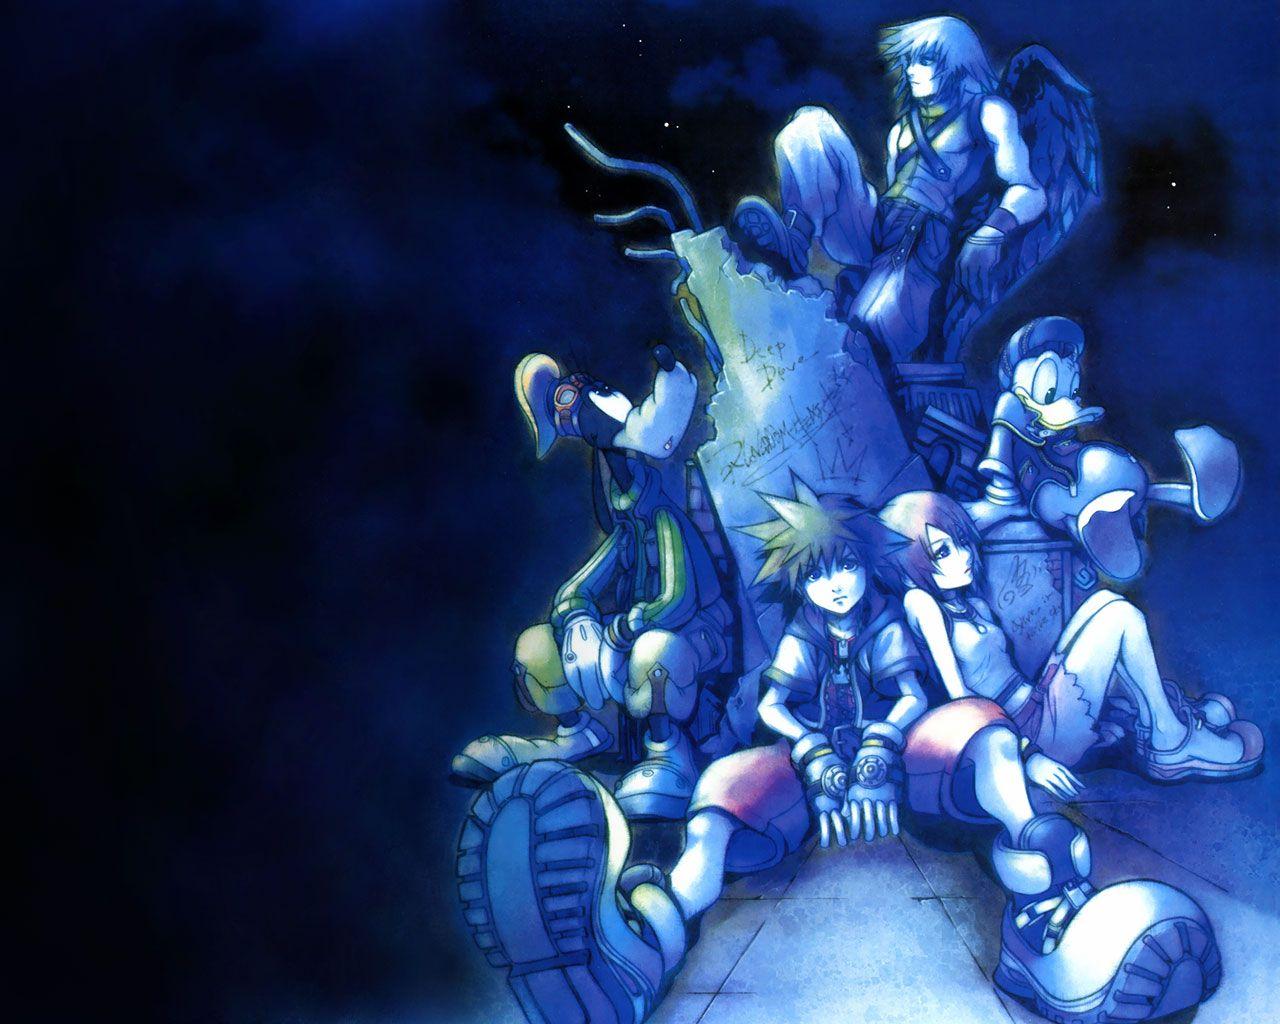 Kingdom Hearts Hearts Final Mix Kingdom Hearts Ii Final Mix From Kingdom Hearts Kingdom Hearts Wallpaper Kingdom Hearts Ii Riku Kingdom Hearts